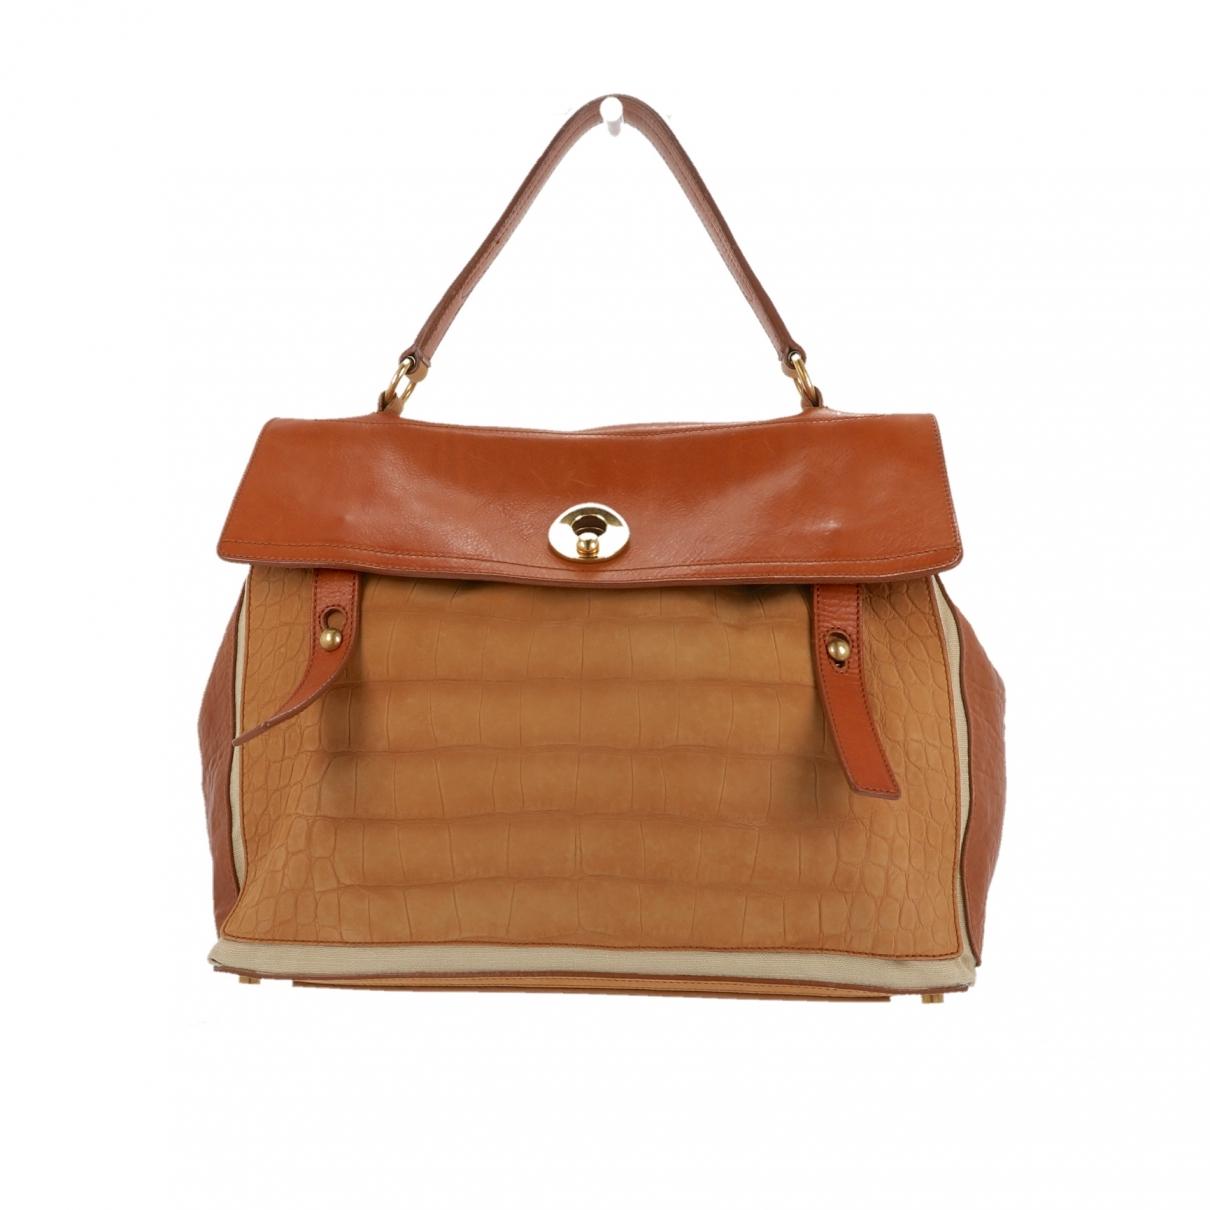 Yves Saint Laurent Muse Two Beige Leather handbag for Women \N